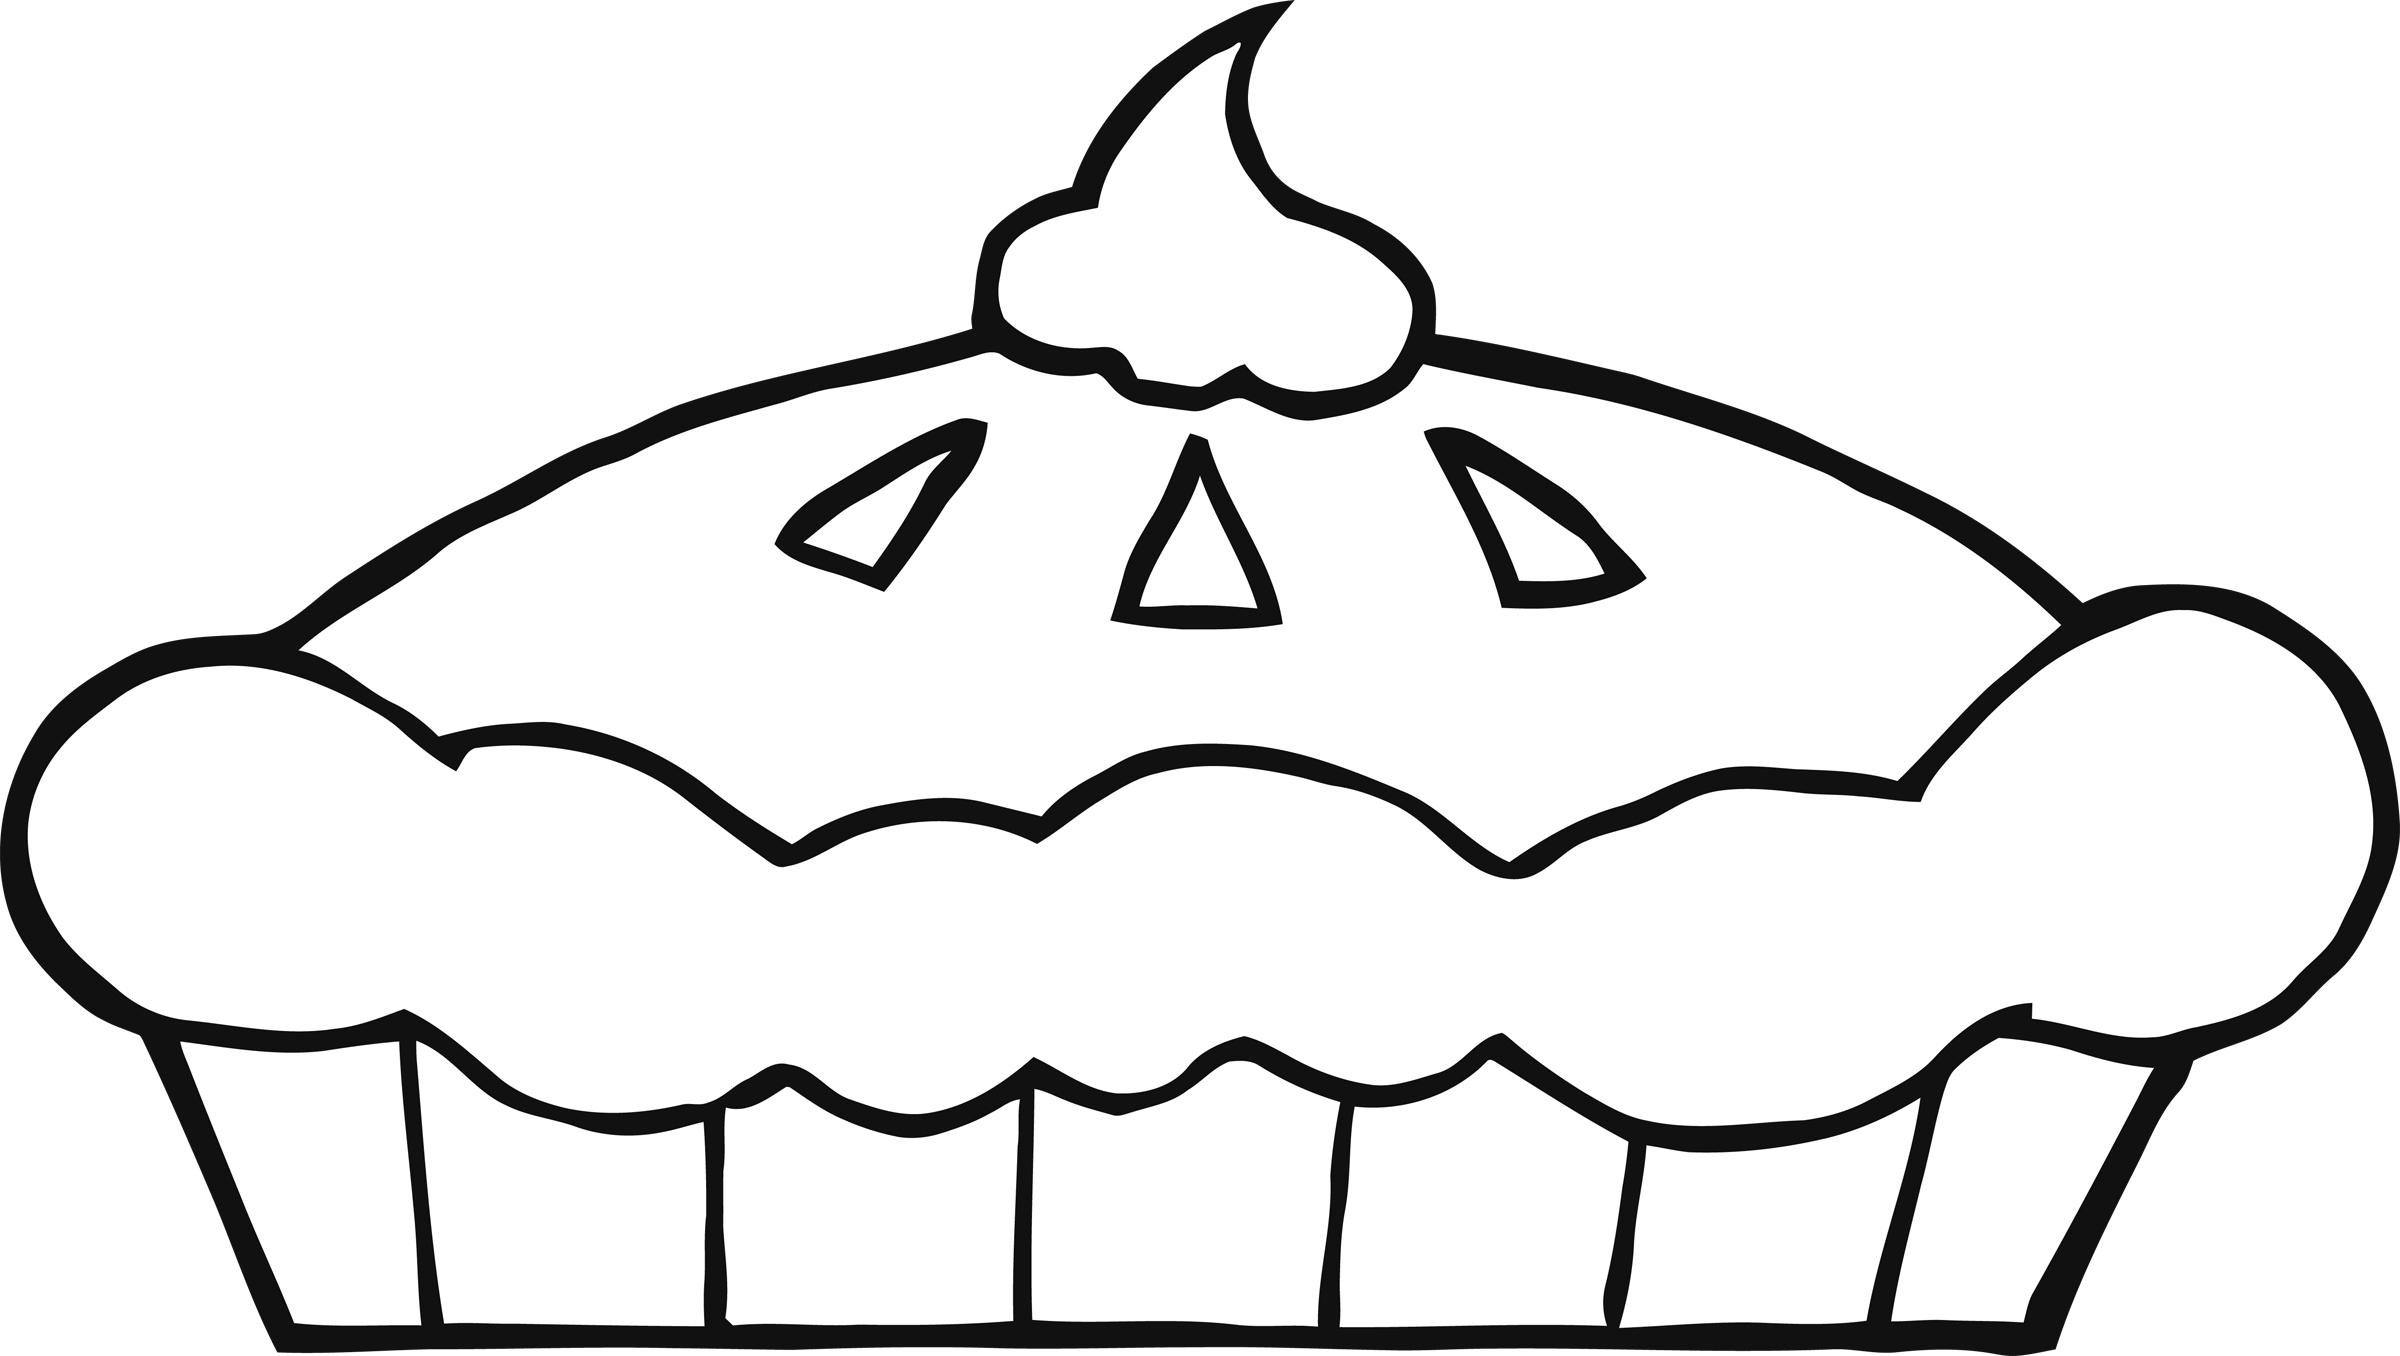 2400x1356 Drawn Pie Cute Cartoon Pencil And In Color Drawn Pie Cute